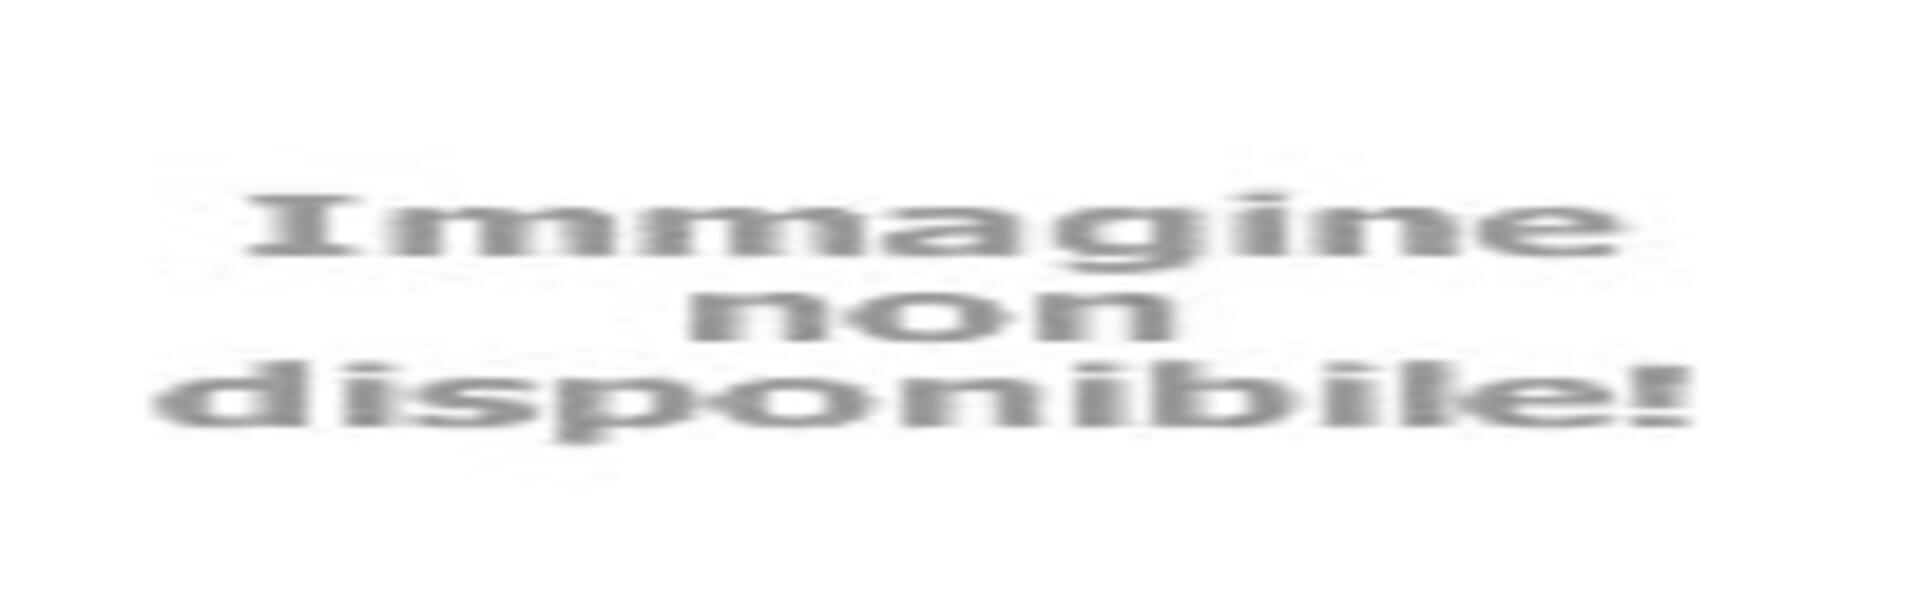 hotelolivo.upgarda it home 008